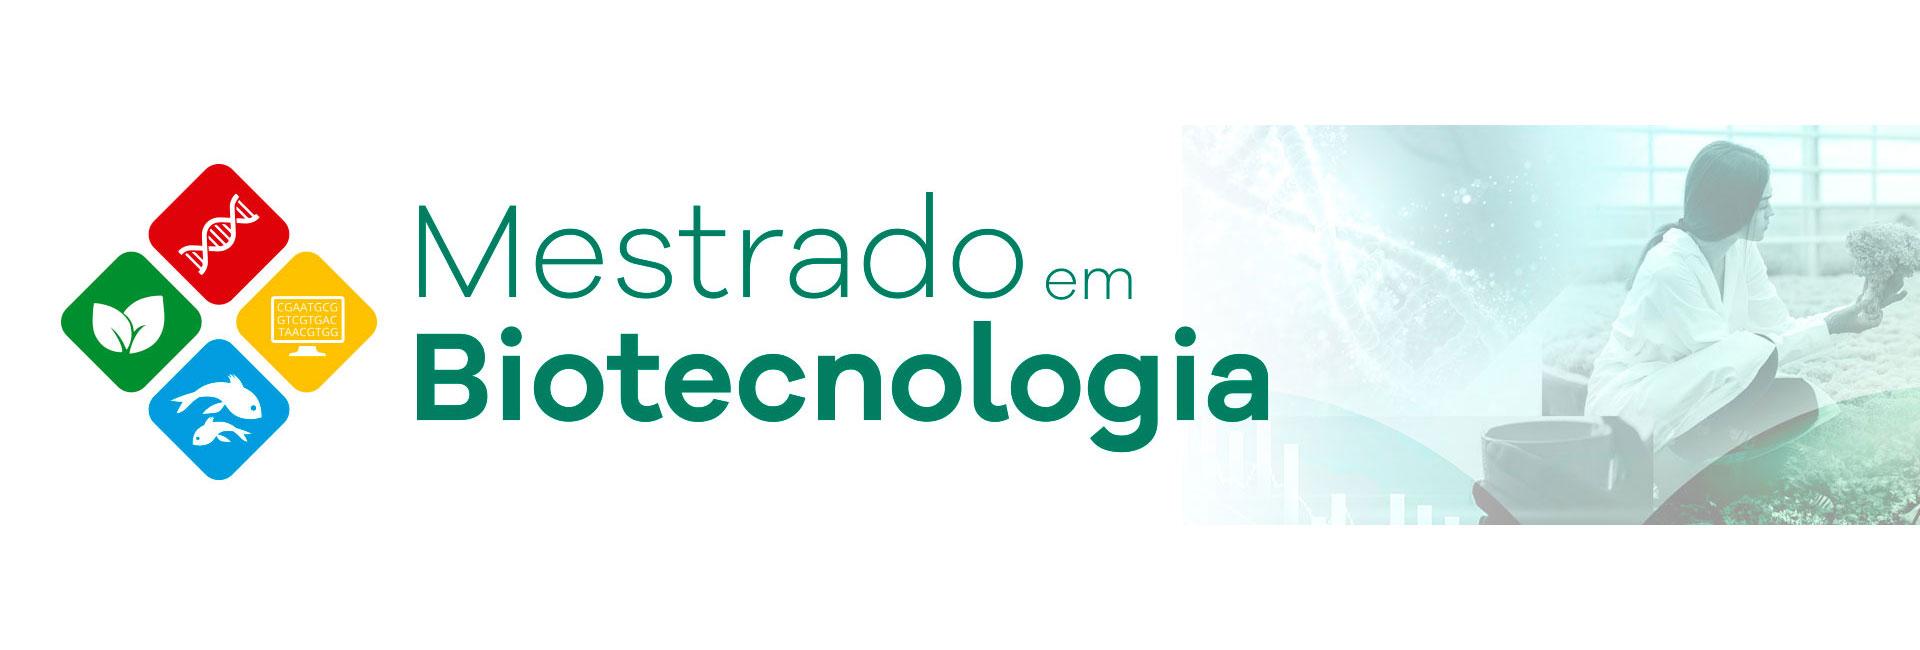 banner-mestrado-biotecnologia-1